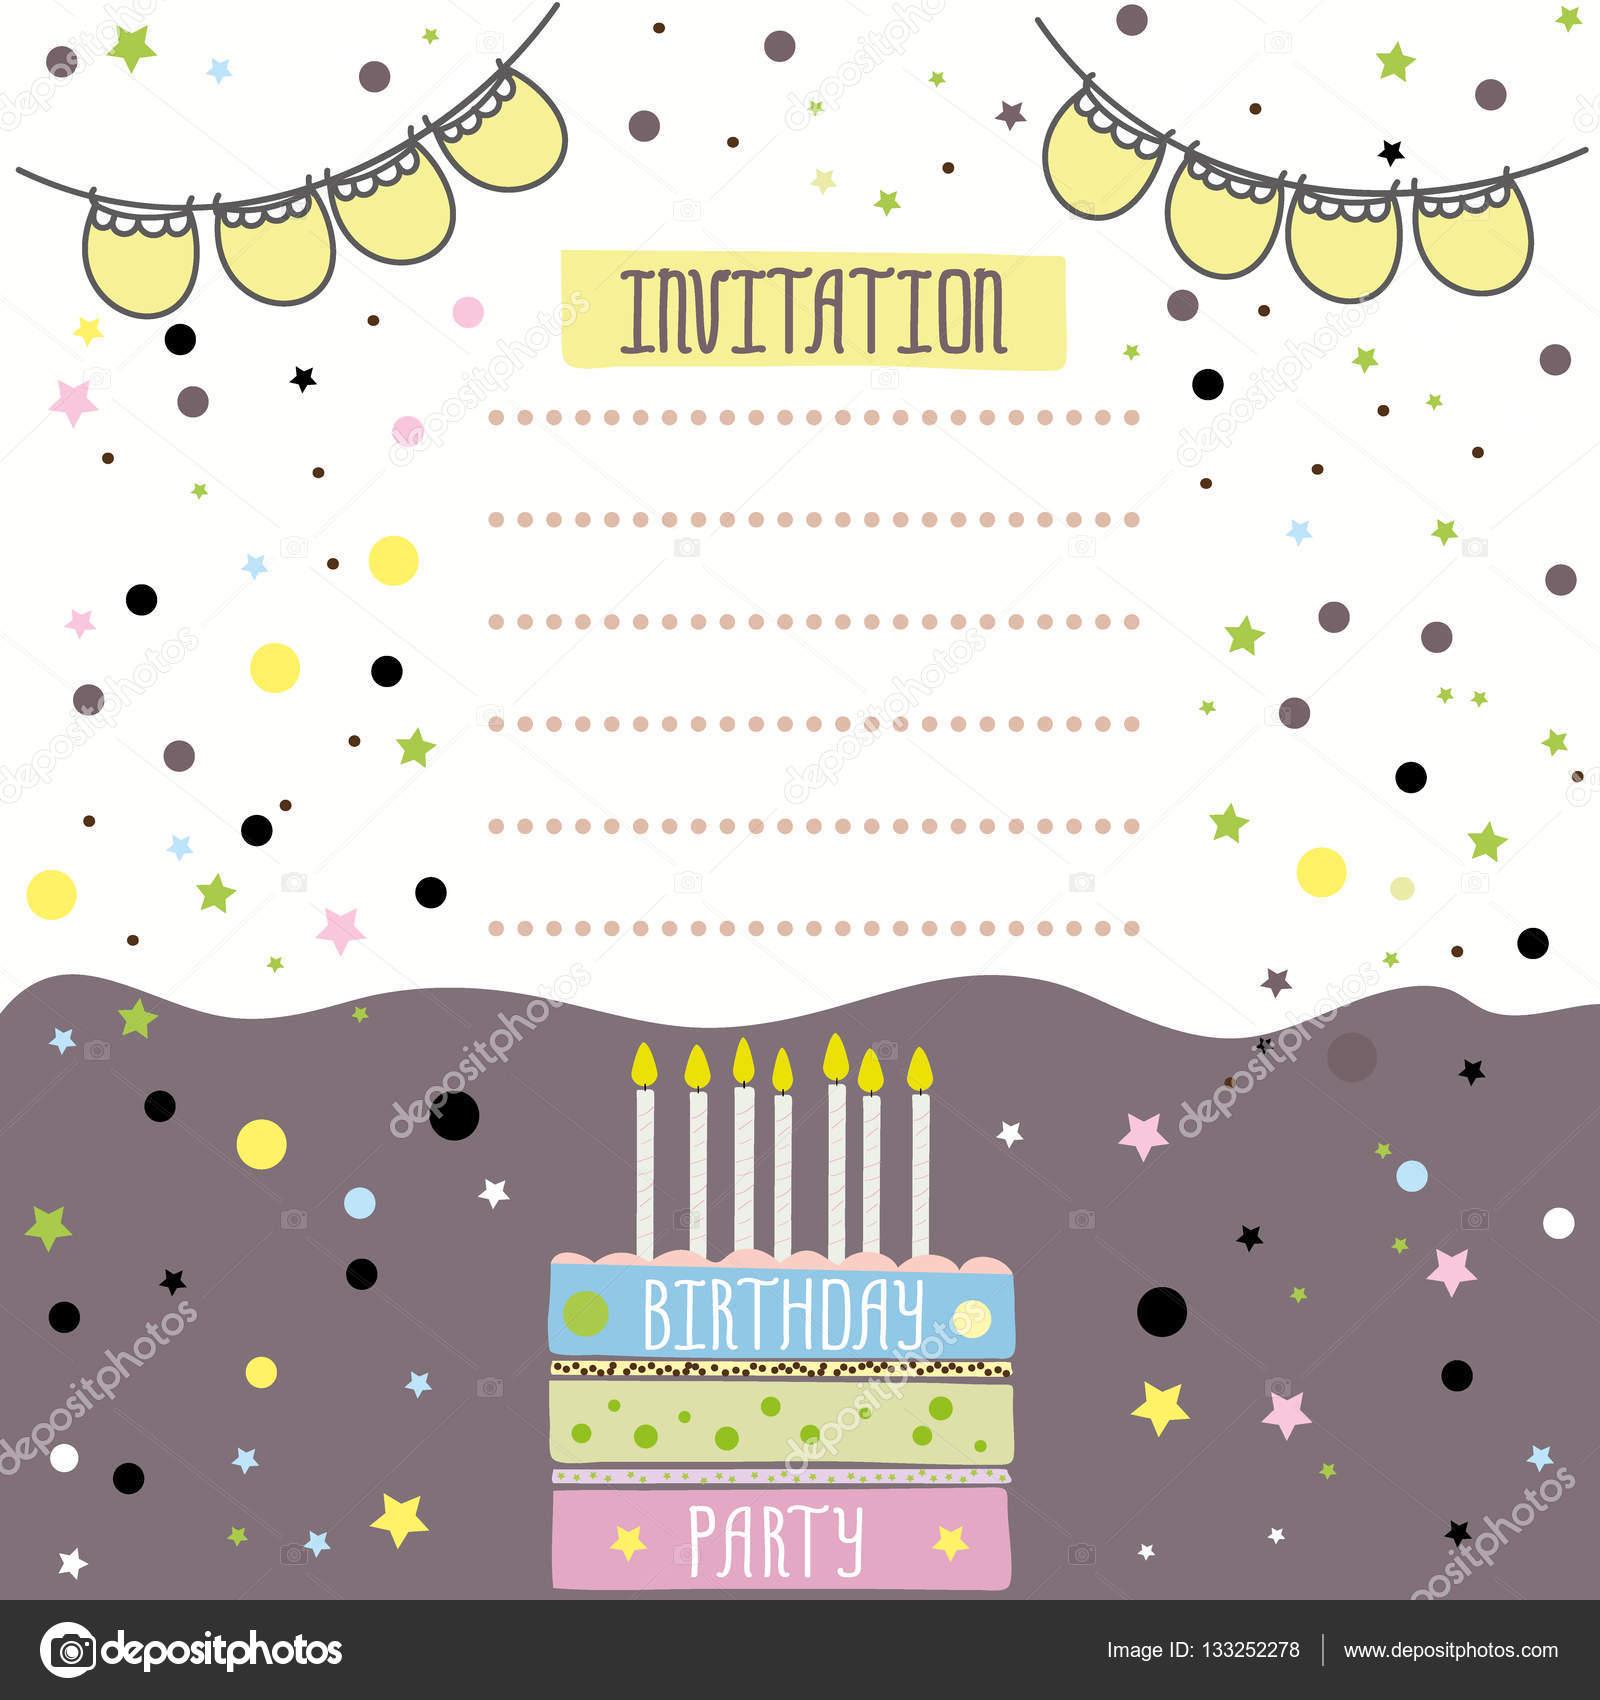 Happy birthday invitation card design stock vector naum100 happy birthday invitation card design vector illustration vector by naum100 stopboris Choice Image